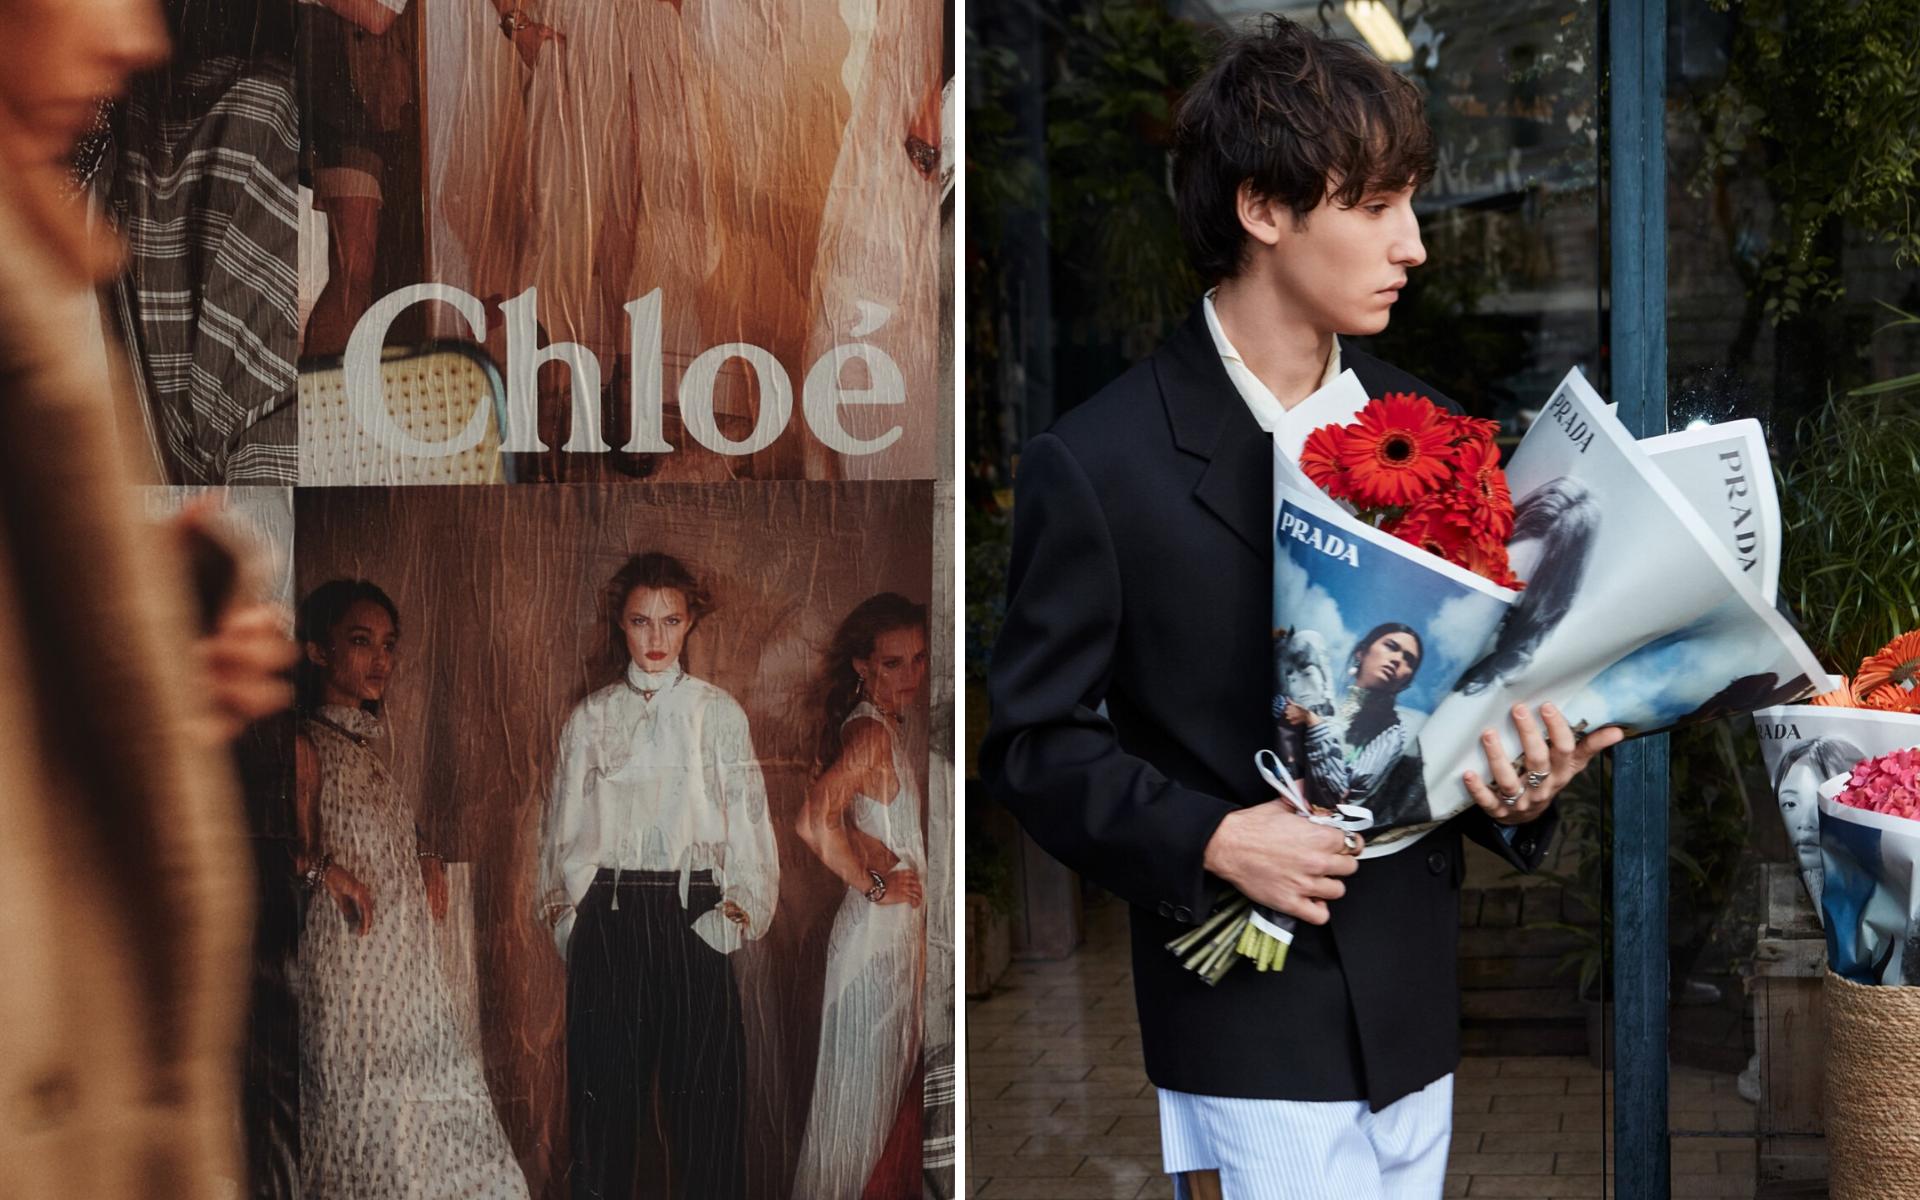 Photo: Chloé and Prada